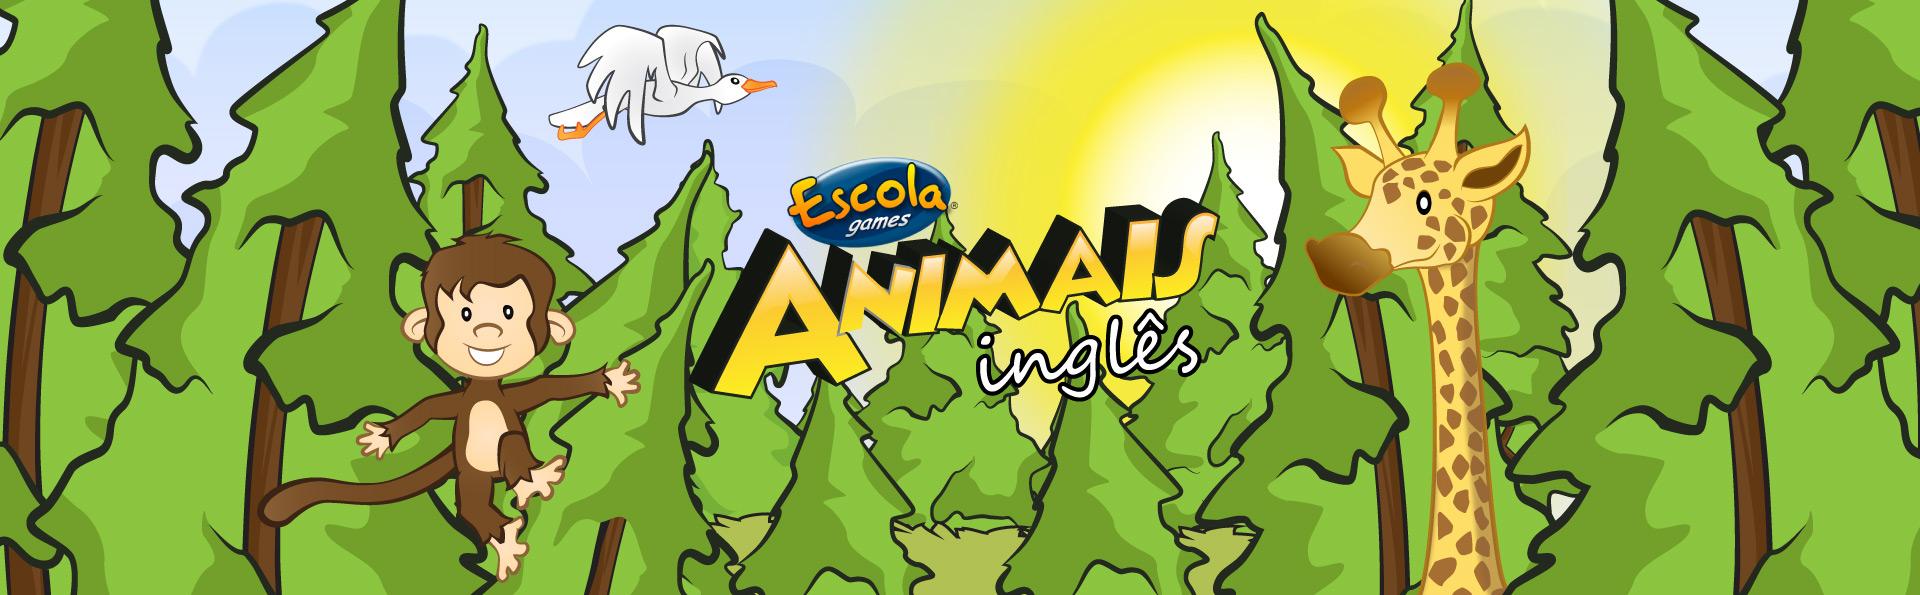 Animais inglês